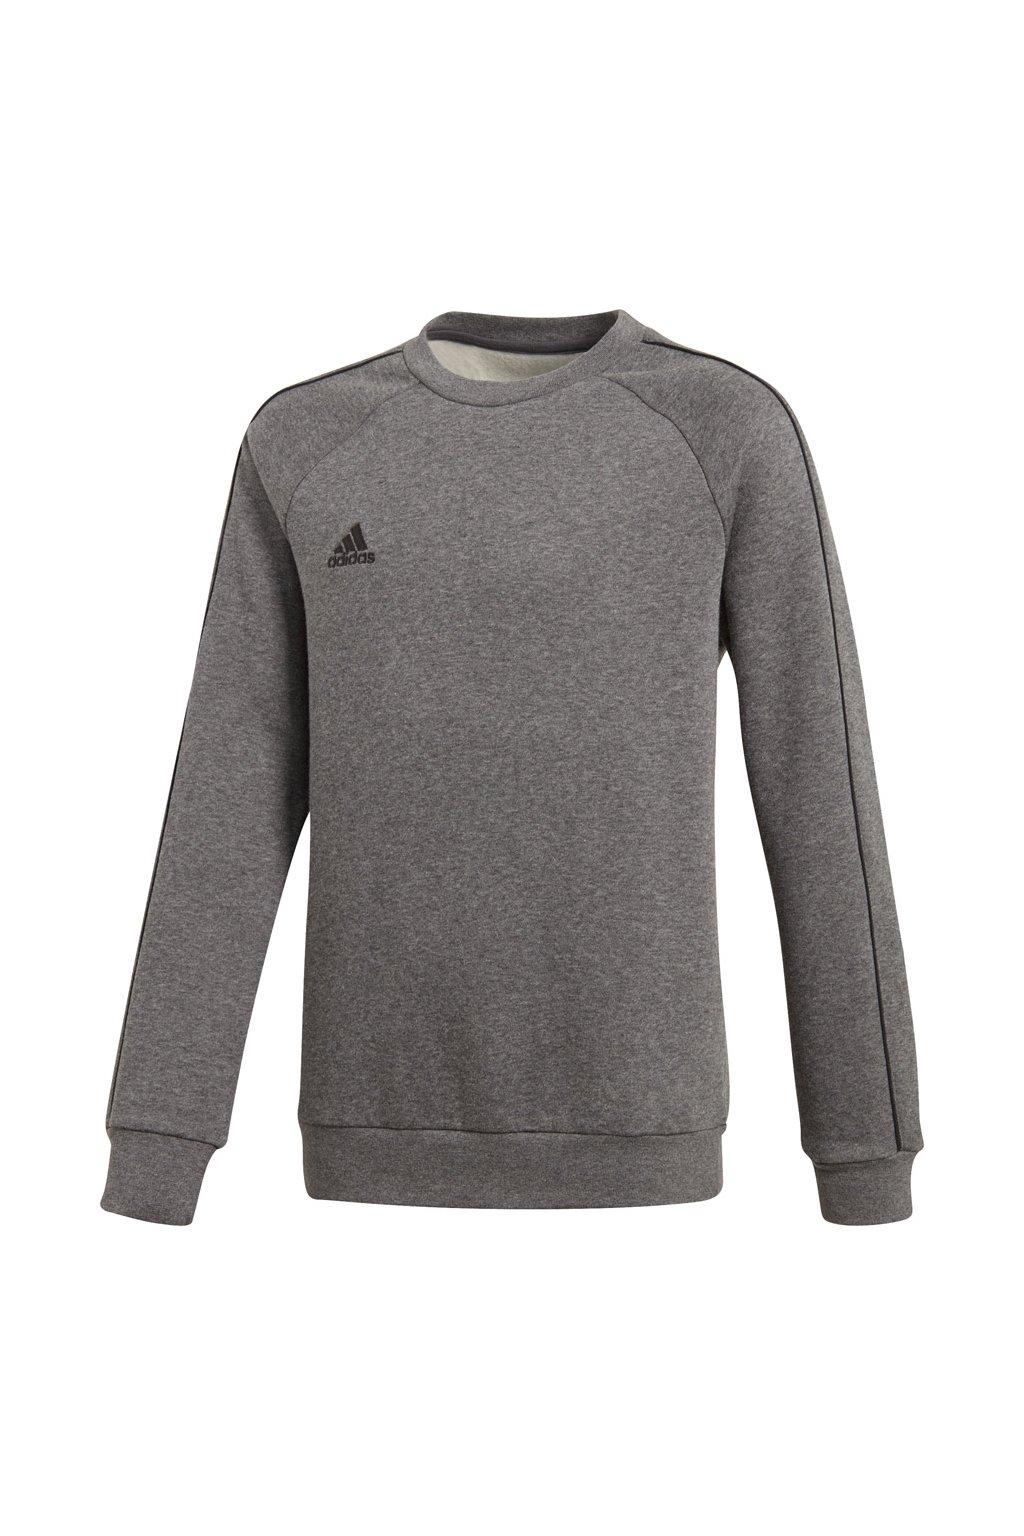 Detská mikina Adidas Core 18 Sweat Top JUNIOR šedá CV3969